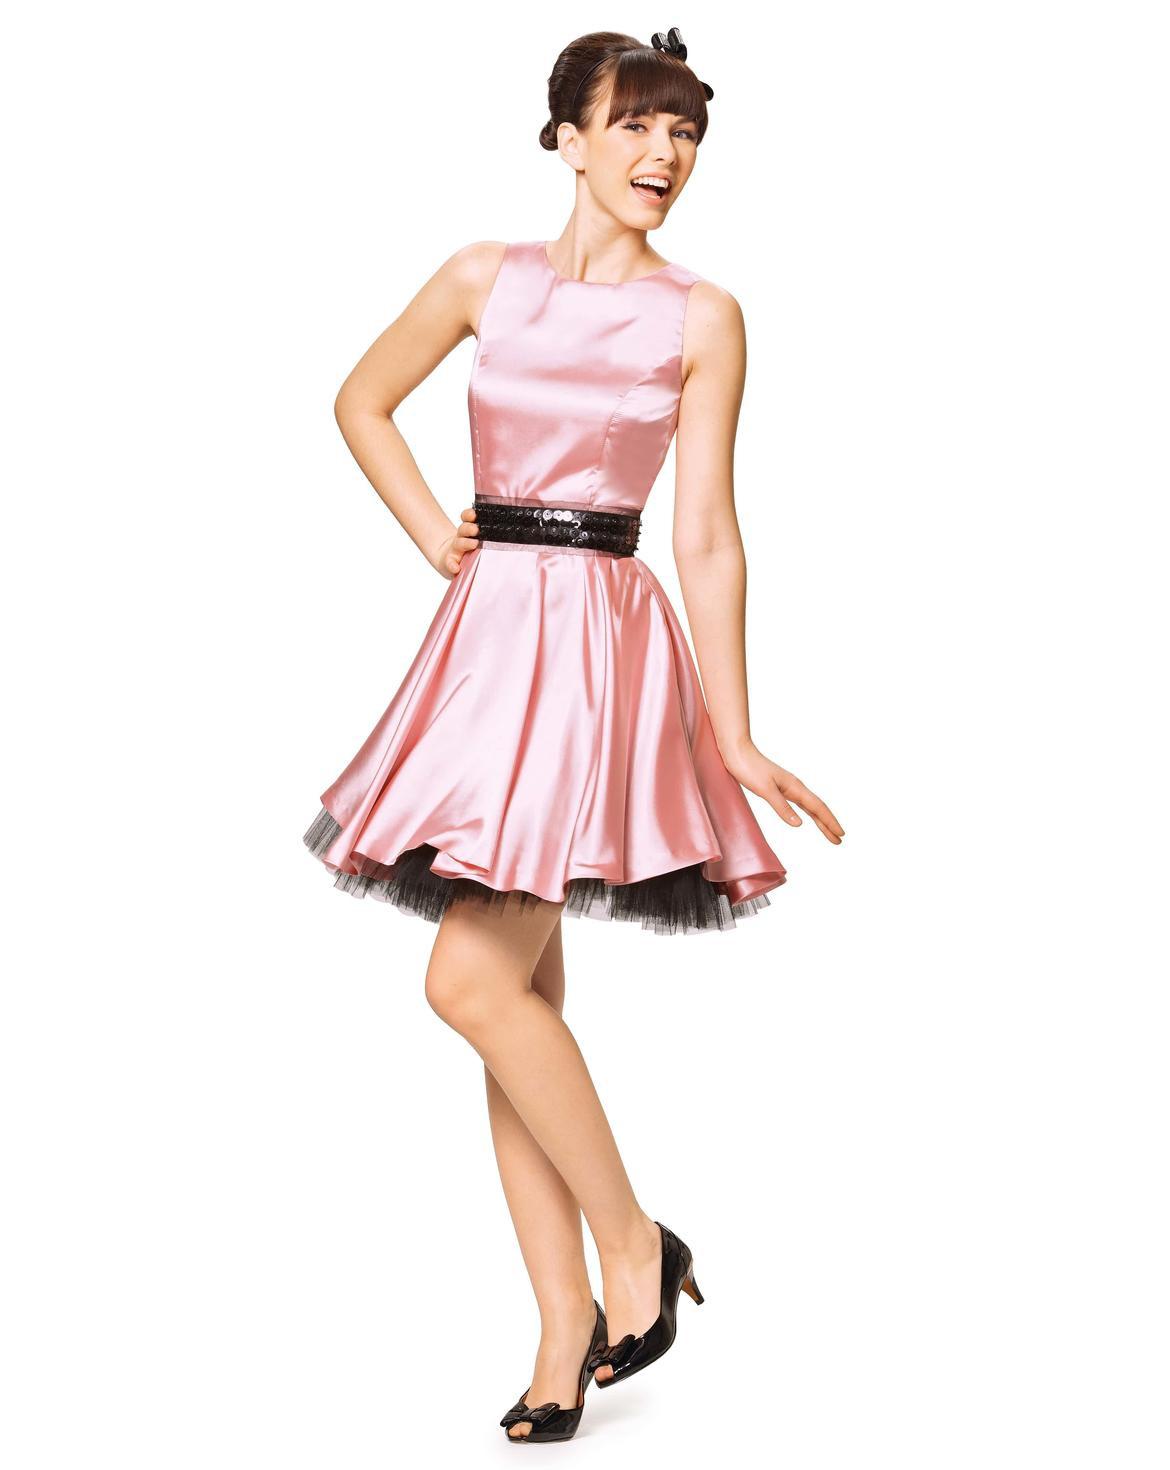 Abend Spektakulär Retro Abendkleid Vertrieb Genial Retro Abendkleid Stylish